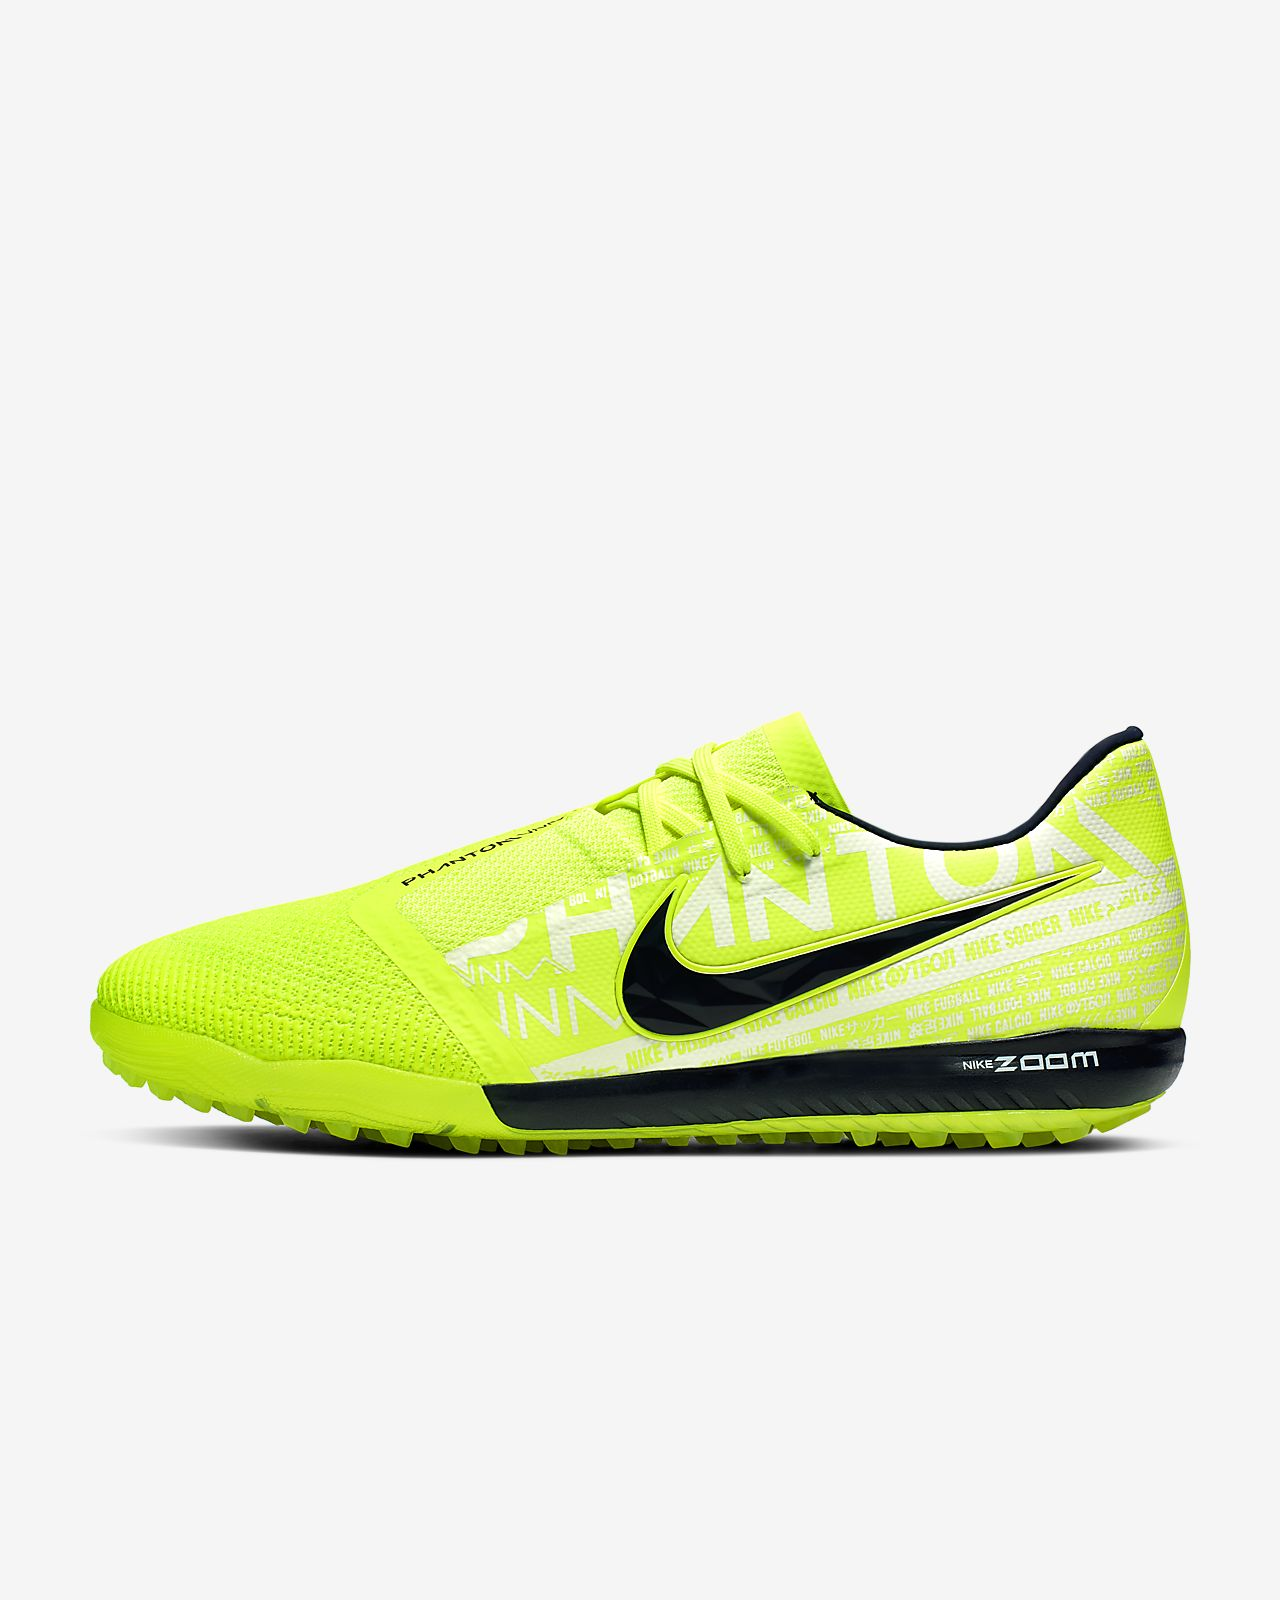 Nike Zoom Phantom Venom Pro TF Botas de fútbol para hierba artificial o moqueta Turf